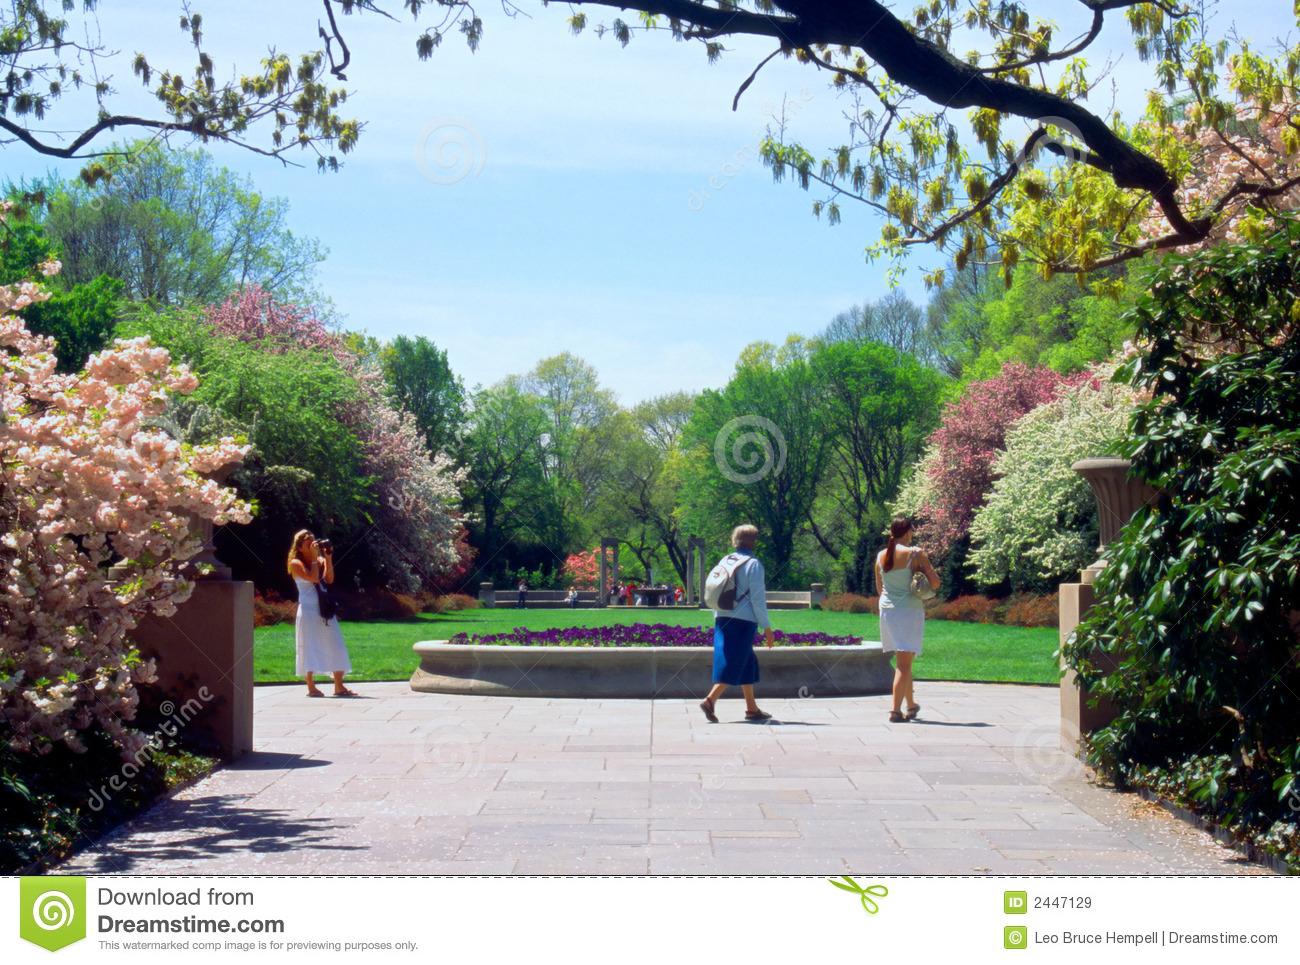 Tourists Brooklyn Botanic Garden New York USA Royalty Free Stock.